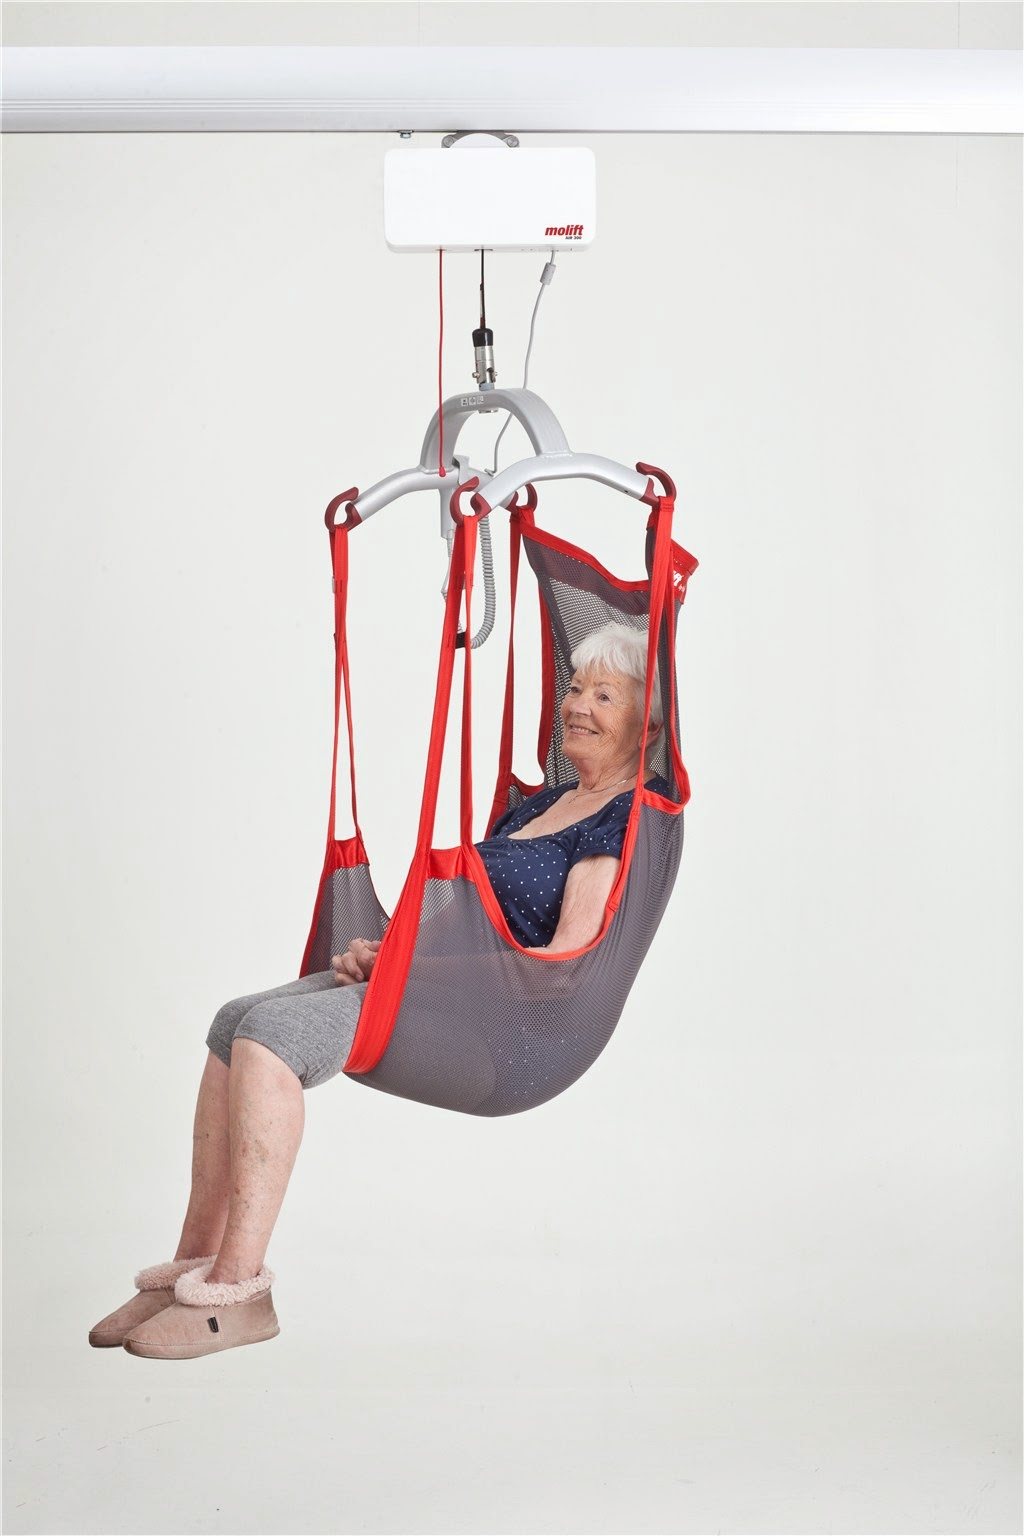 Molift AIR overhead hoist